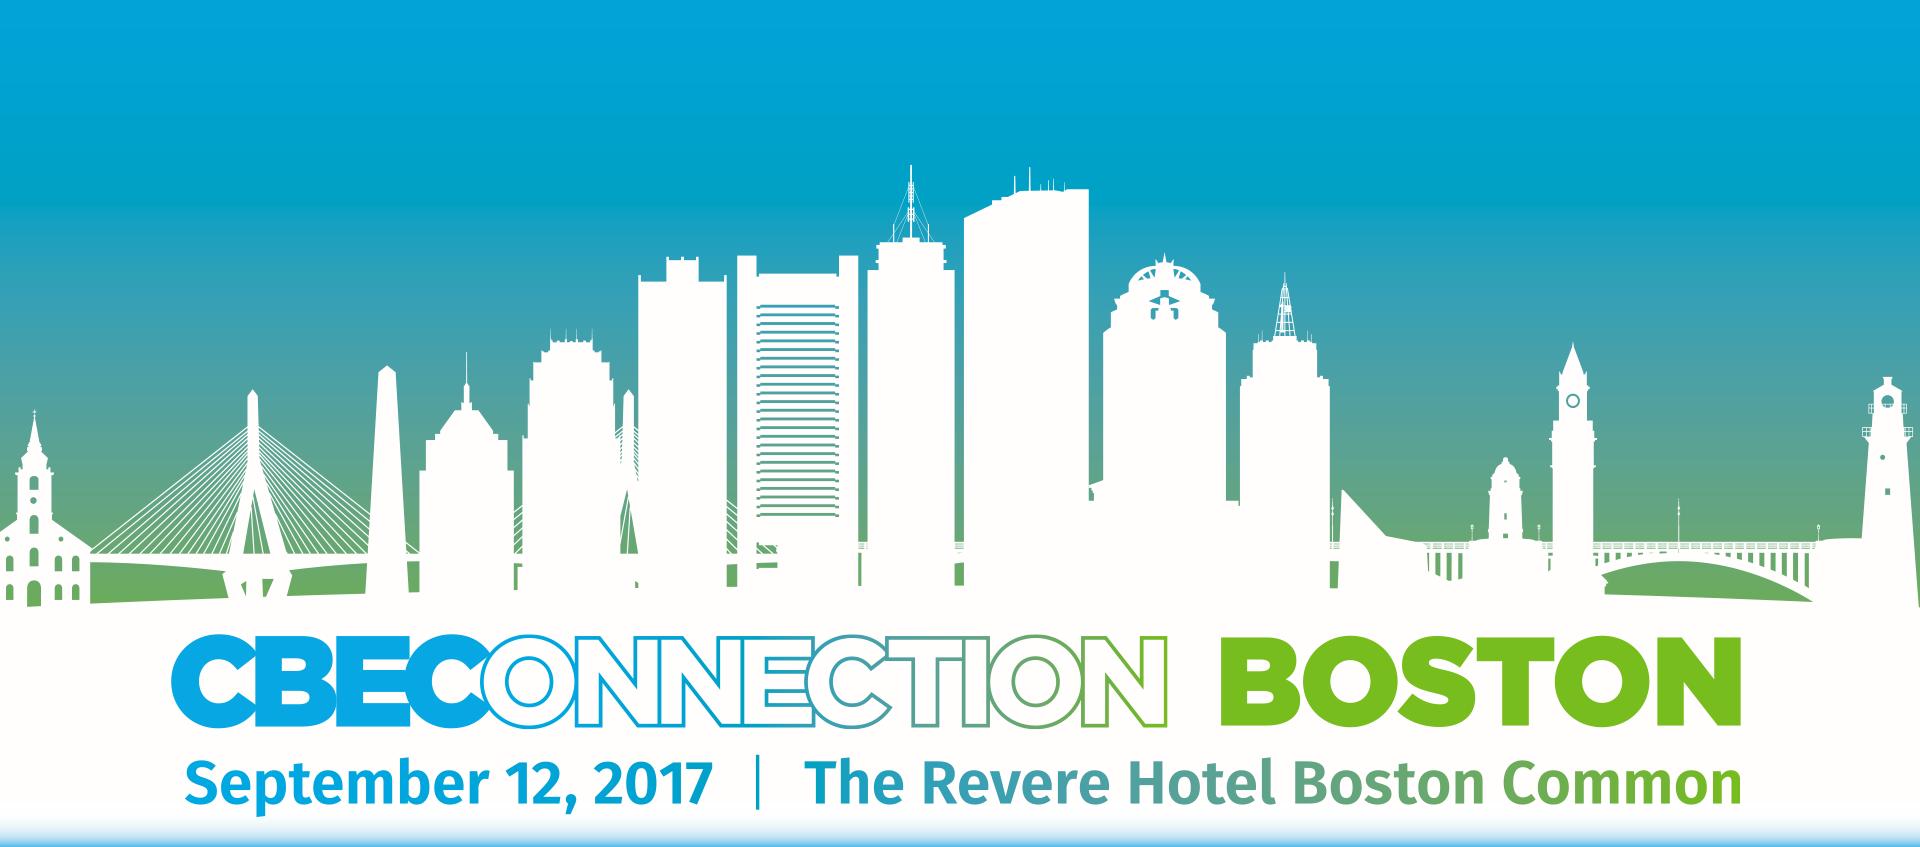 Cannabis Business Executive Convention, Boston 2017